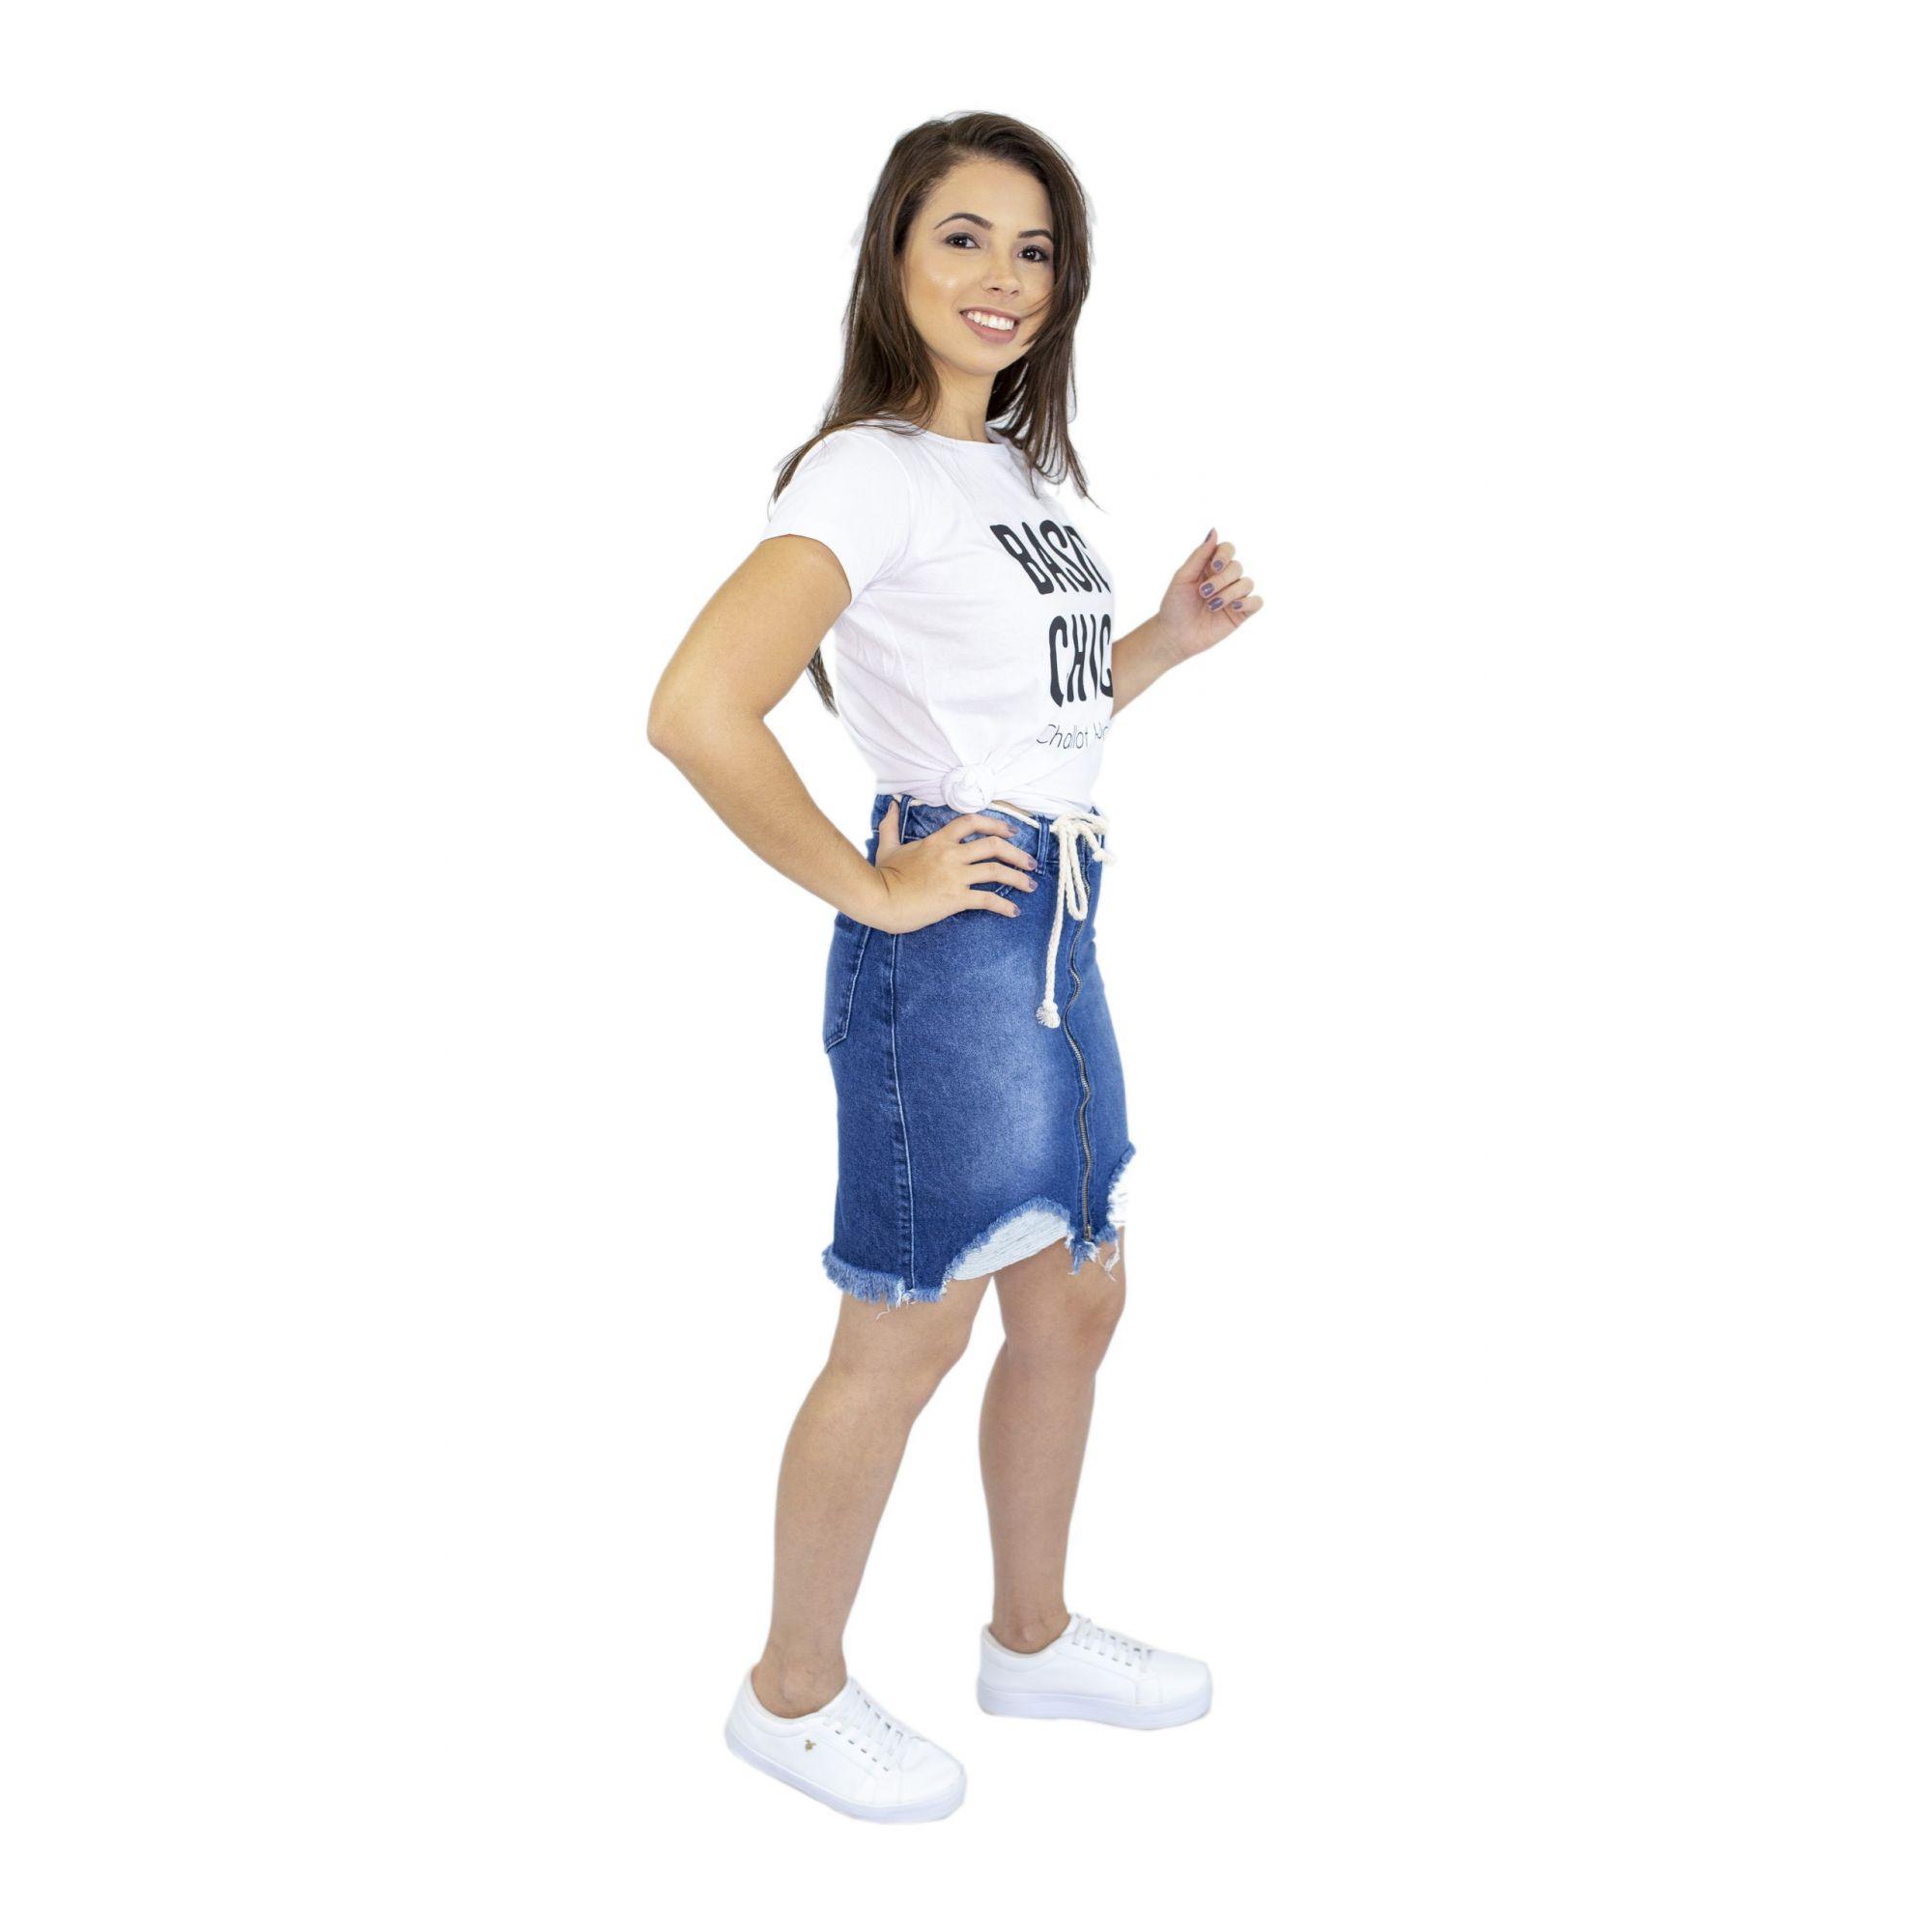 Saia Lorena  - Challot Hadock